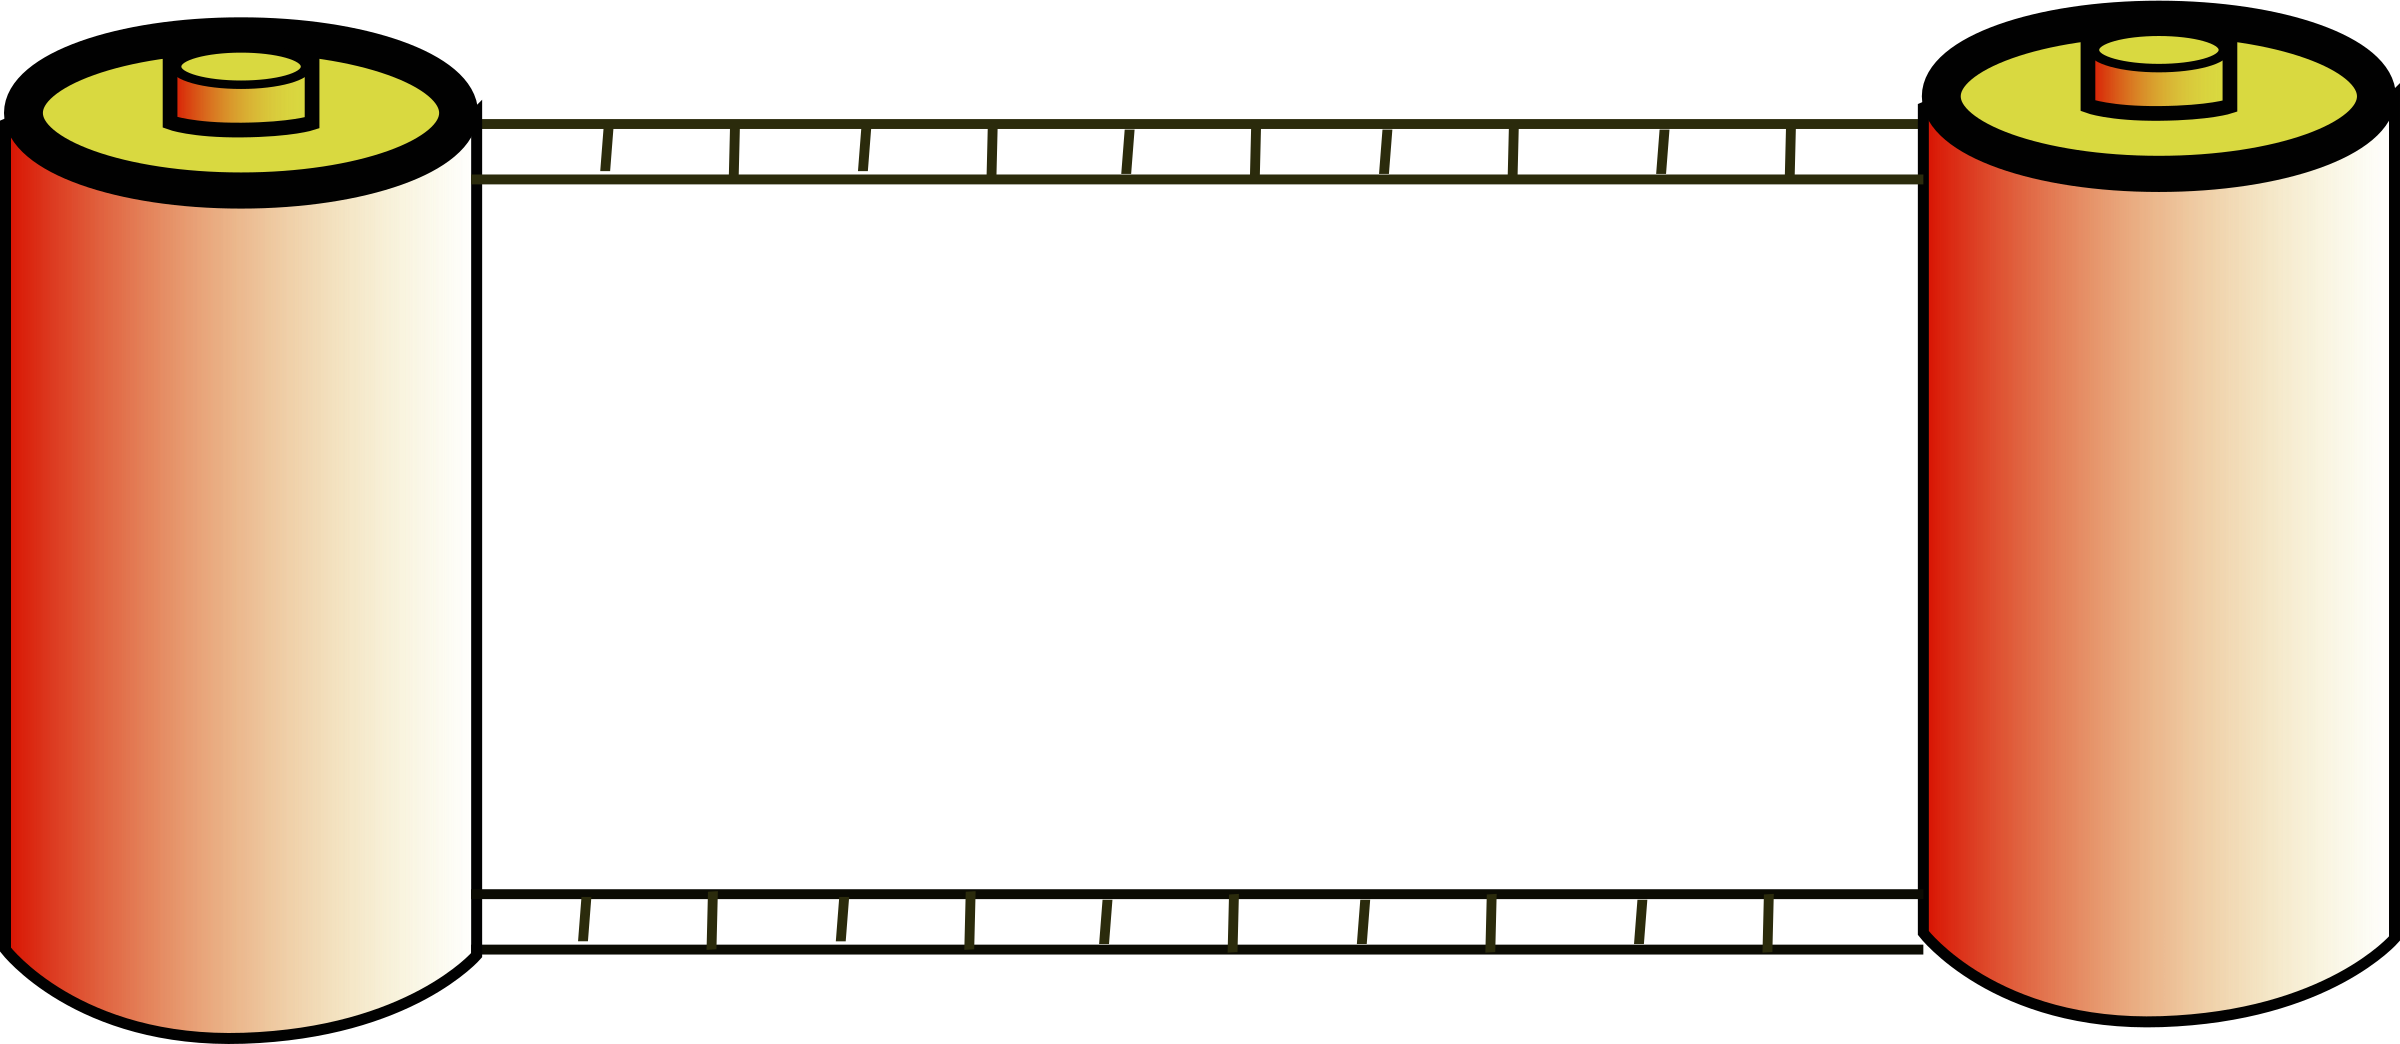 2400x1044 Clipart